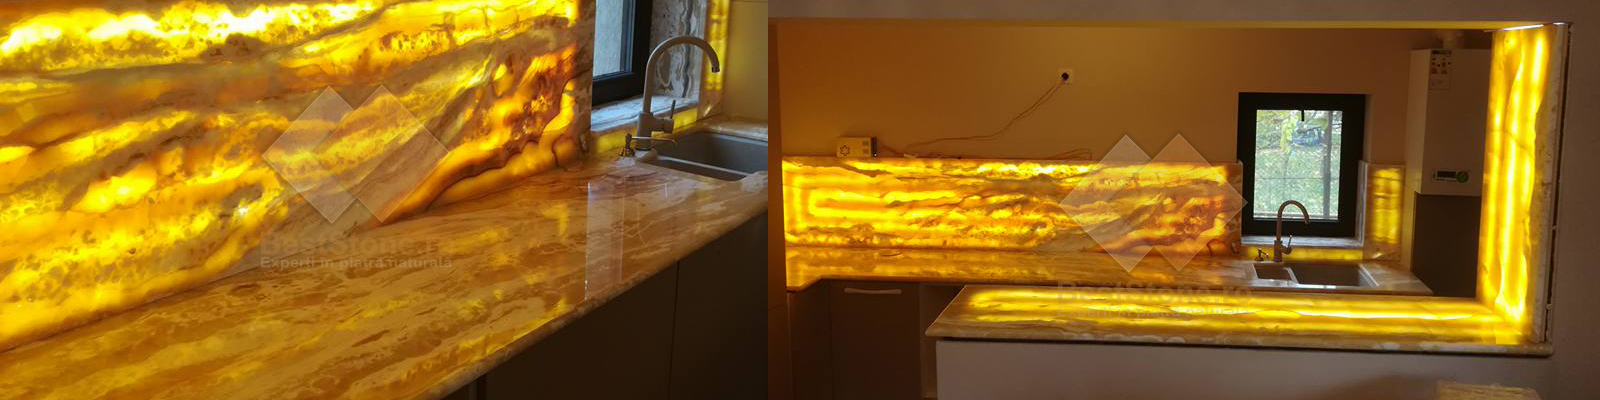 Blaturi din ONIX iluminate cu led.